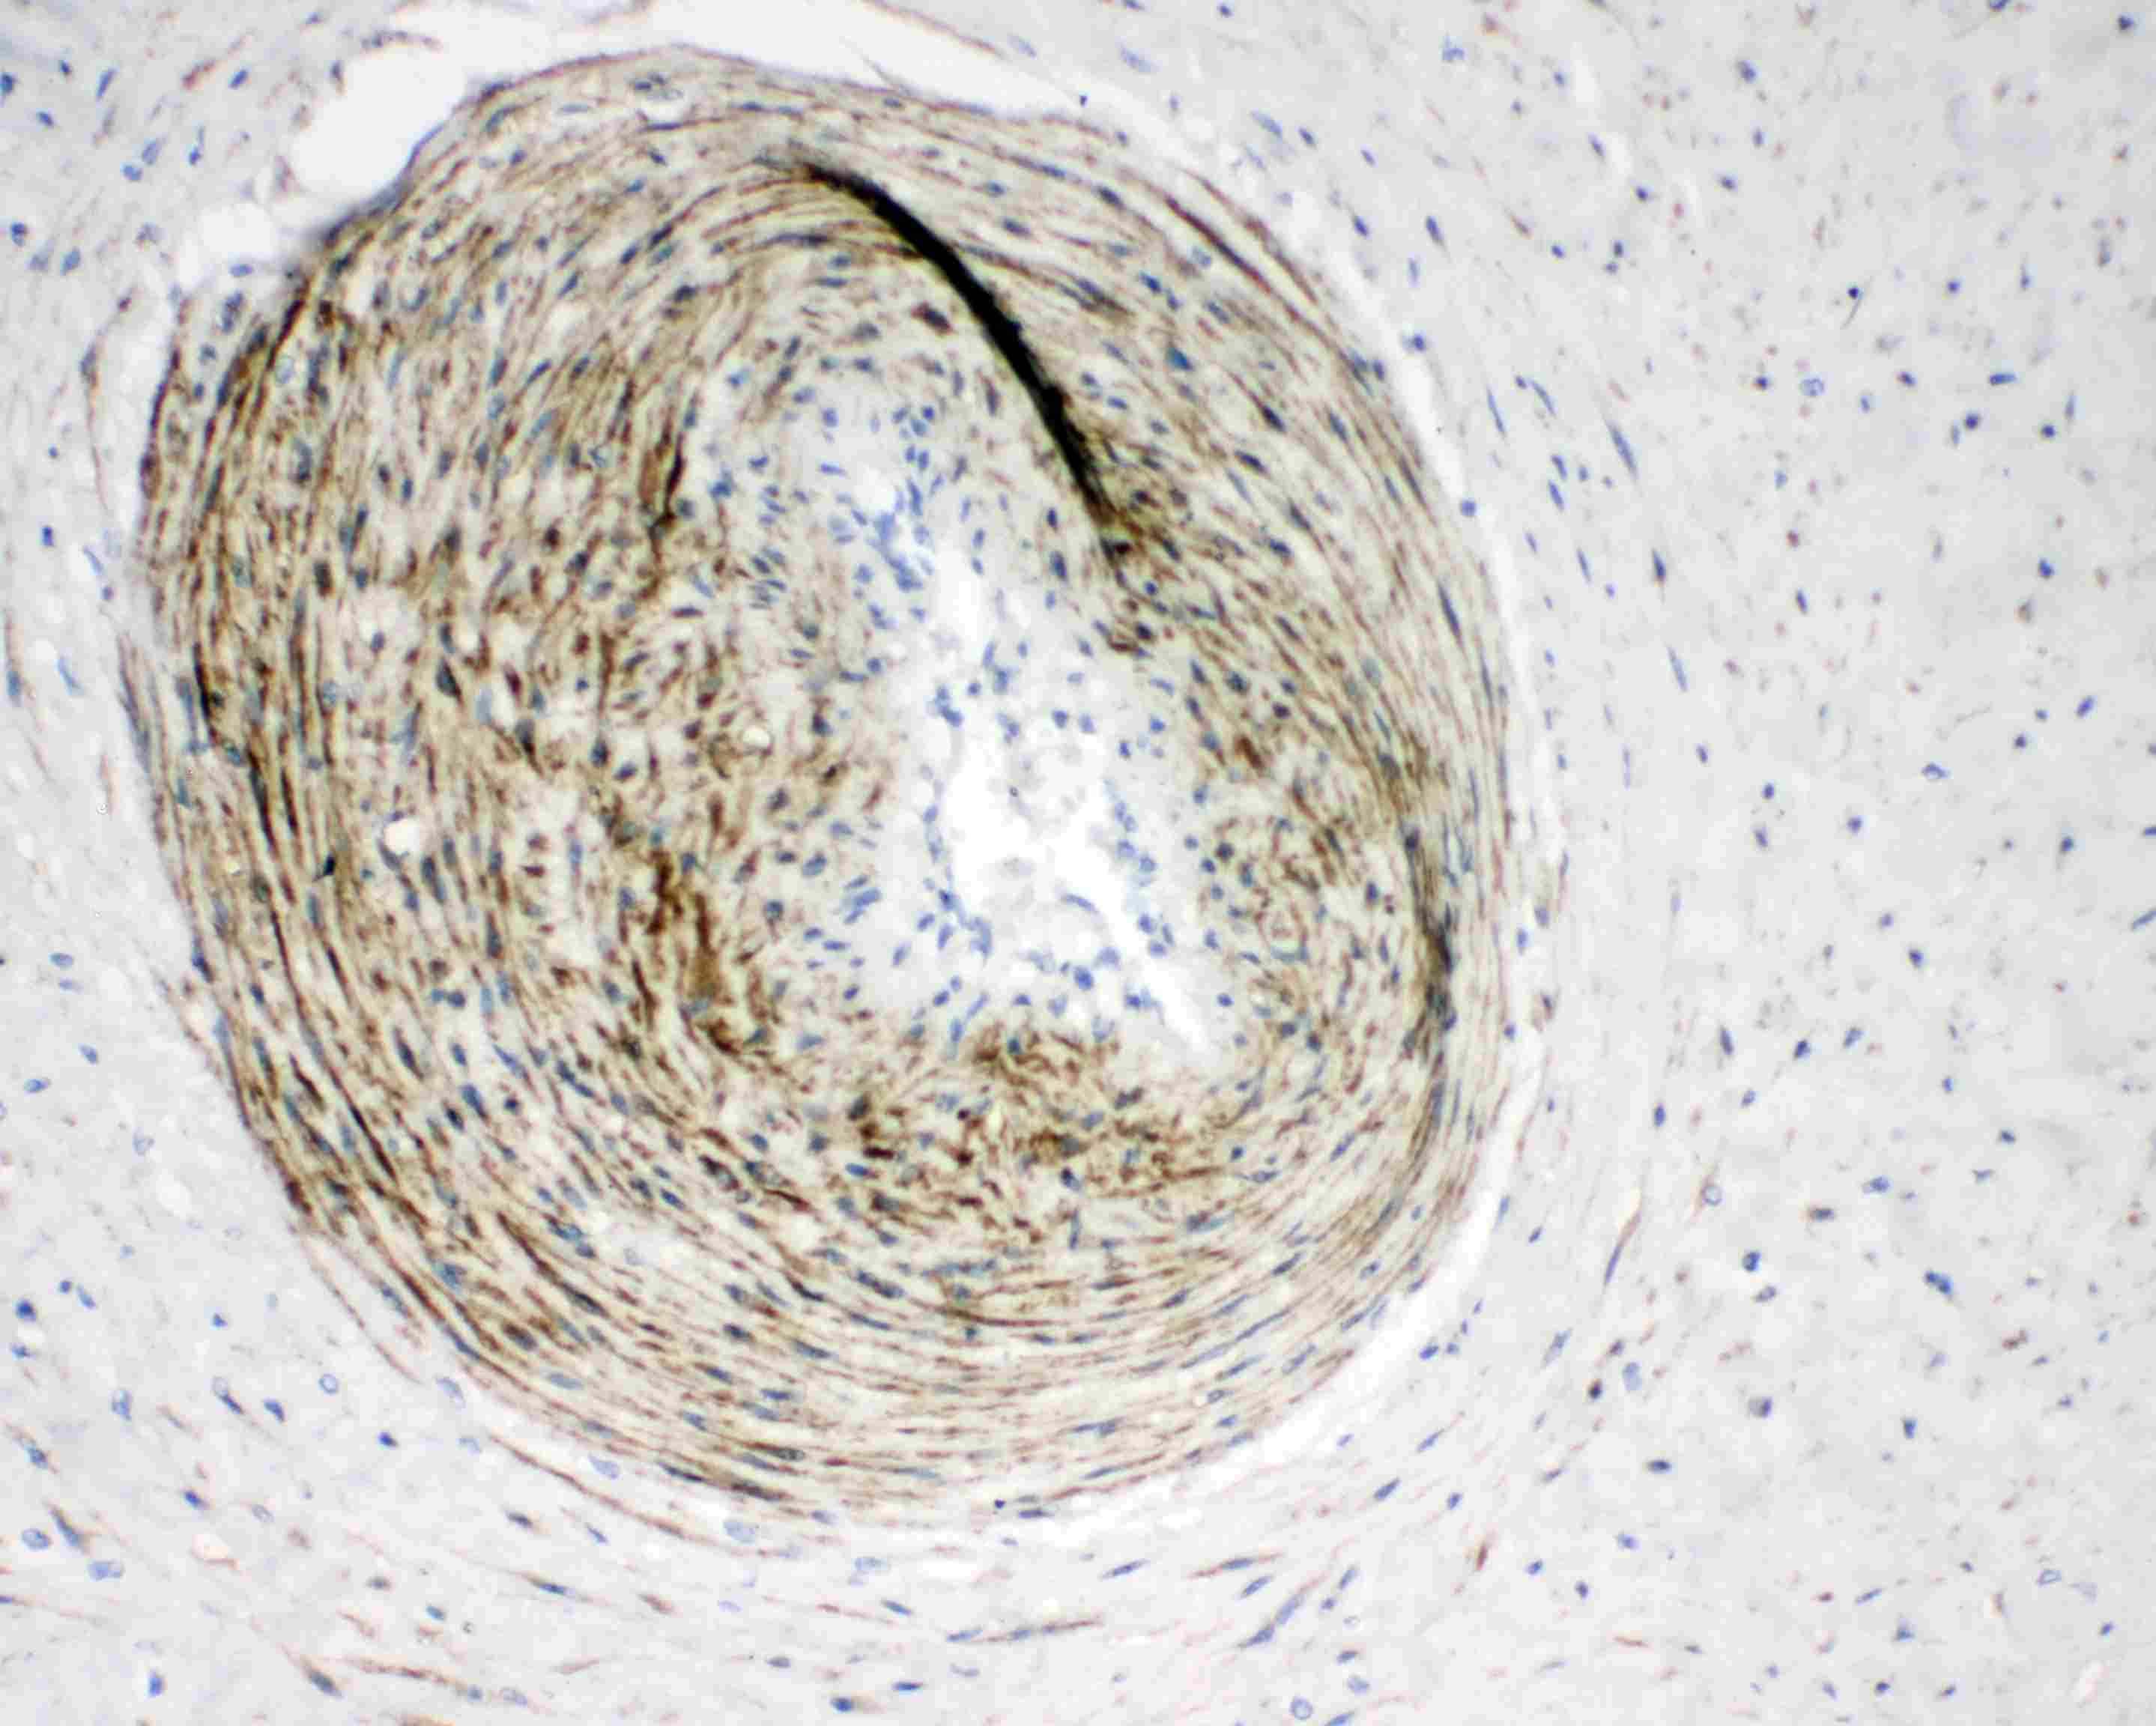 Calponin 1 Antibody in Immunohistochemistry (Paraffin) (IHC (P))